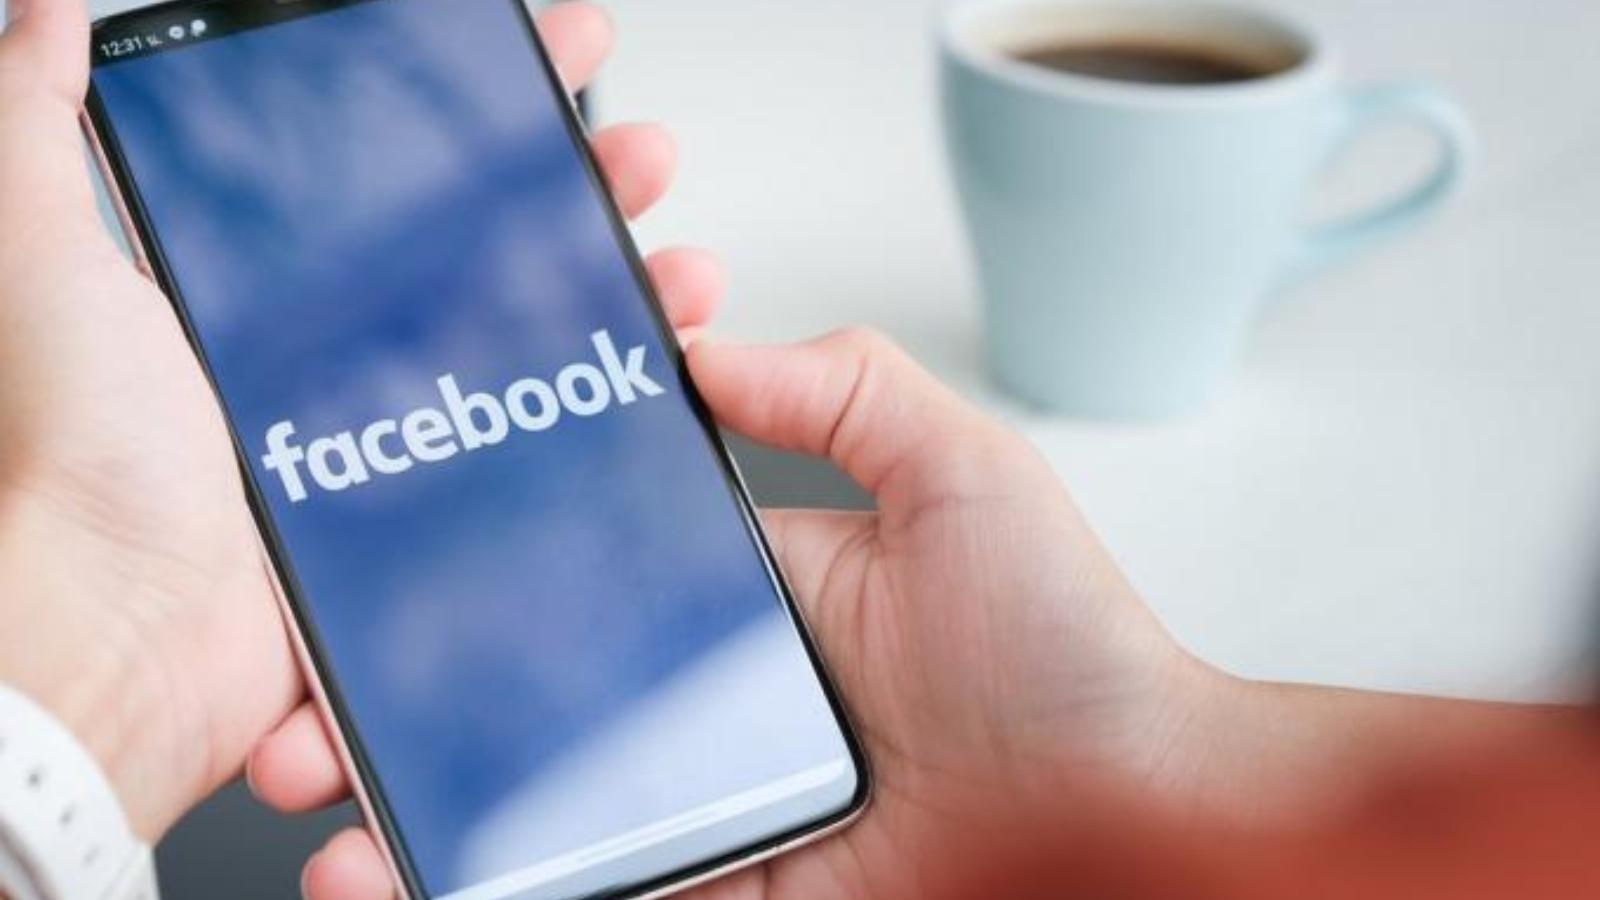 Facebook: Διέρρευσαν τα προσωπικά δεδομένα 553 εκατομμυρίων λογαριασμών